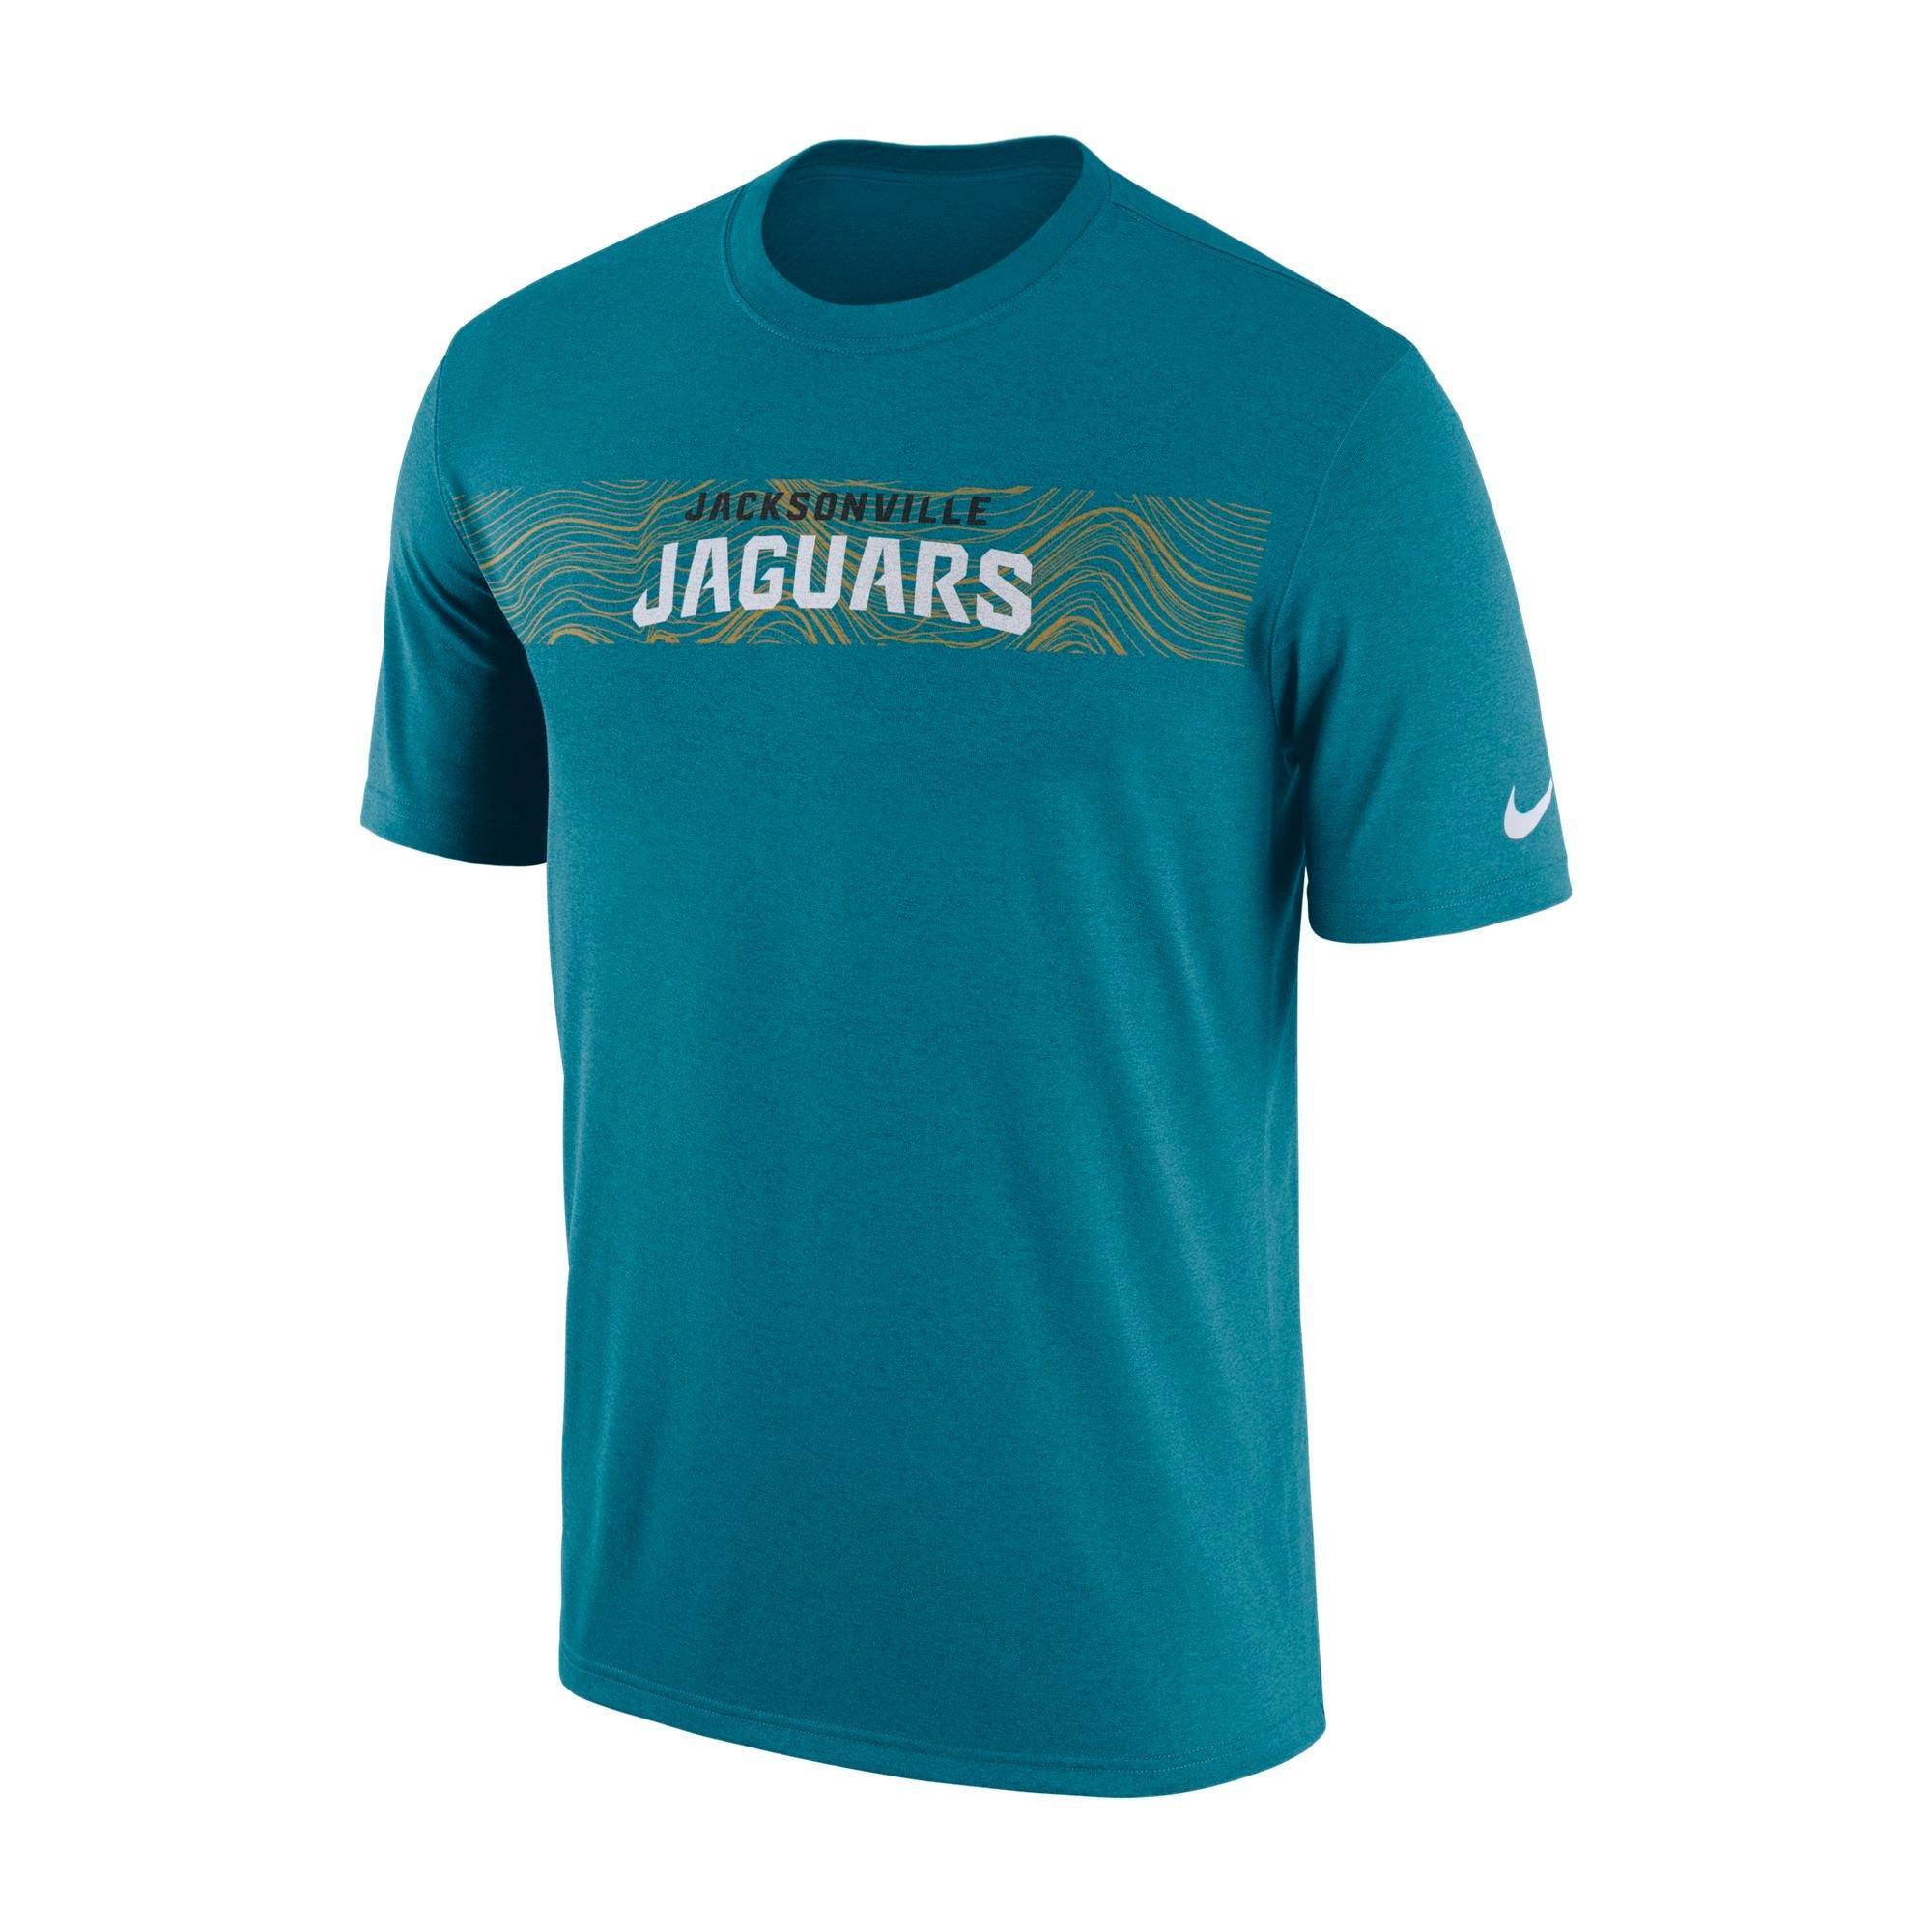 Nike Menu0027s Jacksonville Jaguars Legend On Field Seismic Dri Fit Teal T Shirt